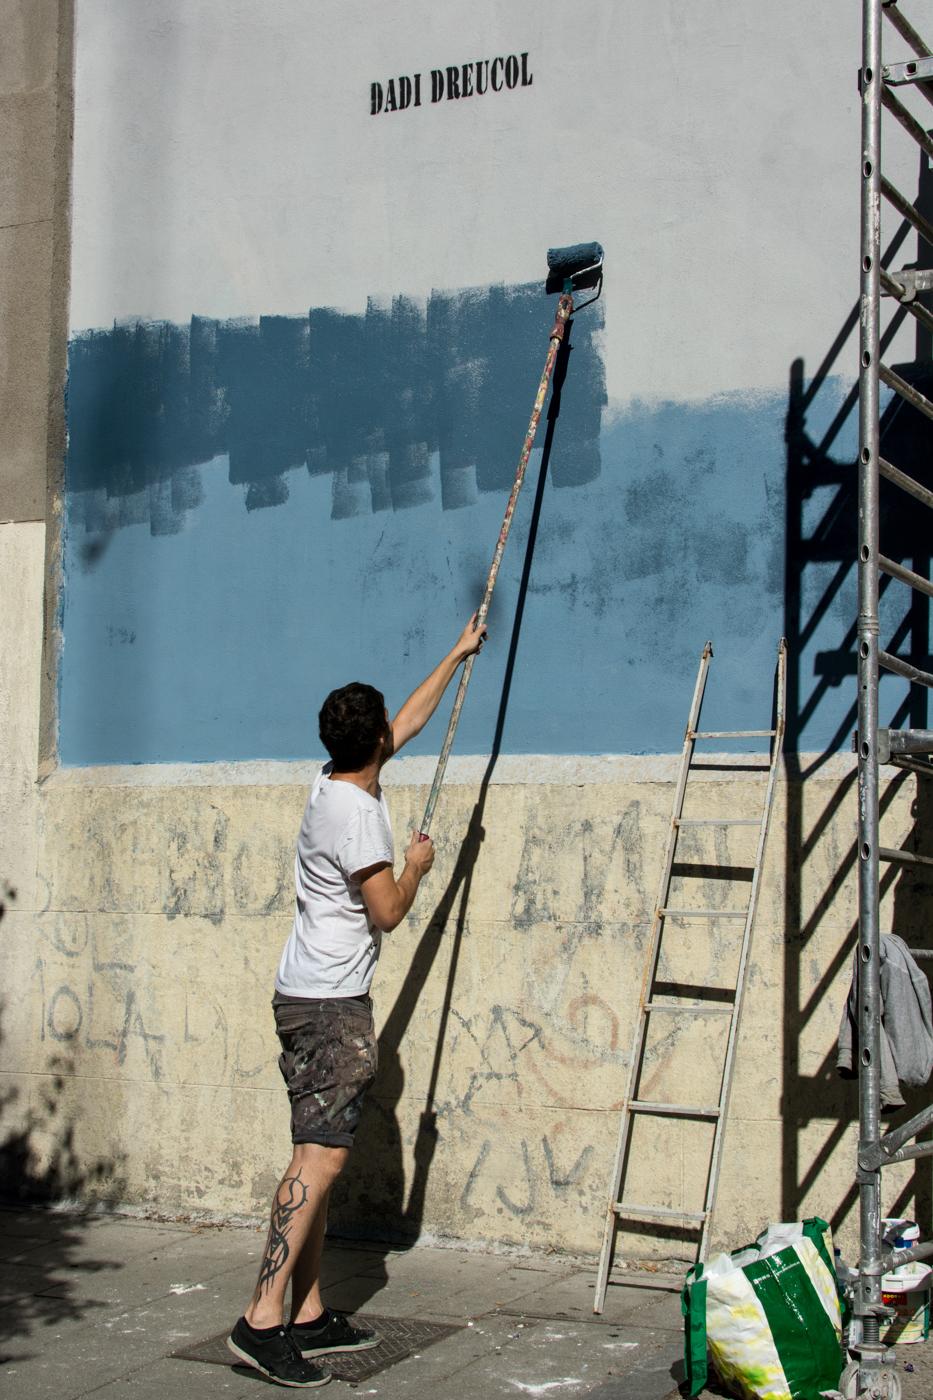 Dadi Dreucol proceso - MurosTabacalera by Guillermo de la Madrid - Madrid Street Art Project -06.jpg